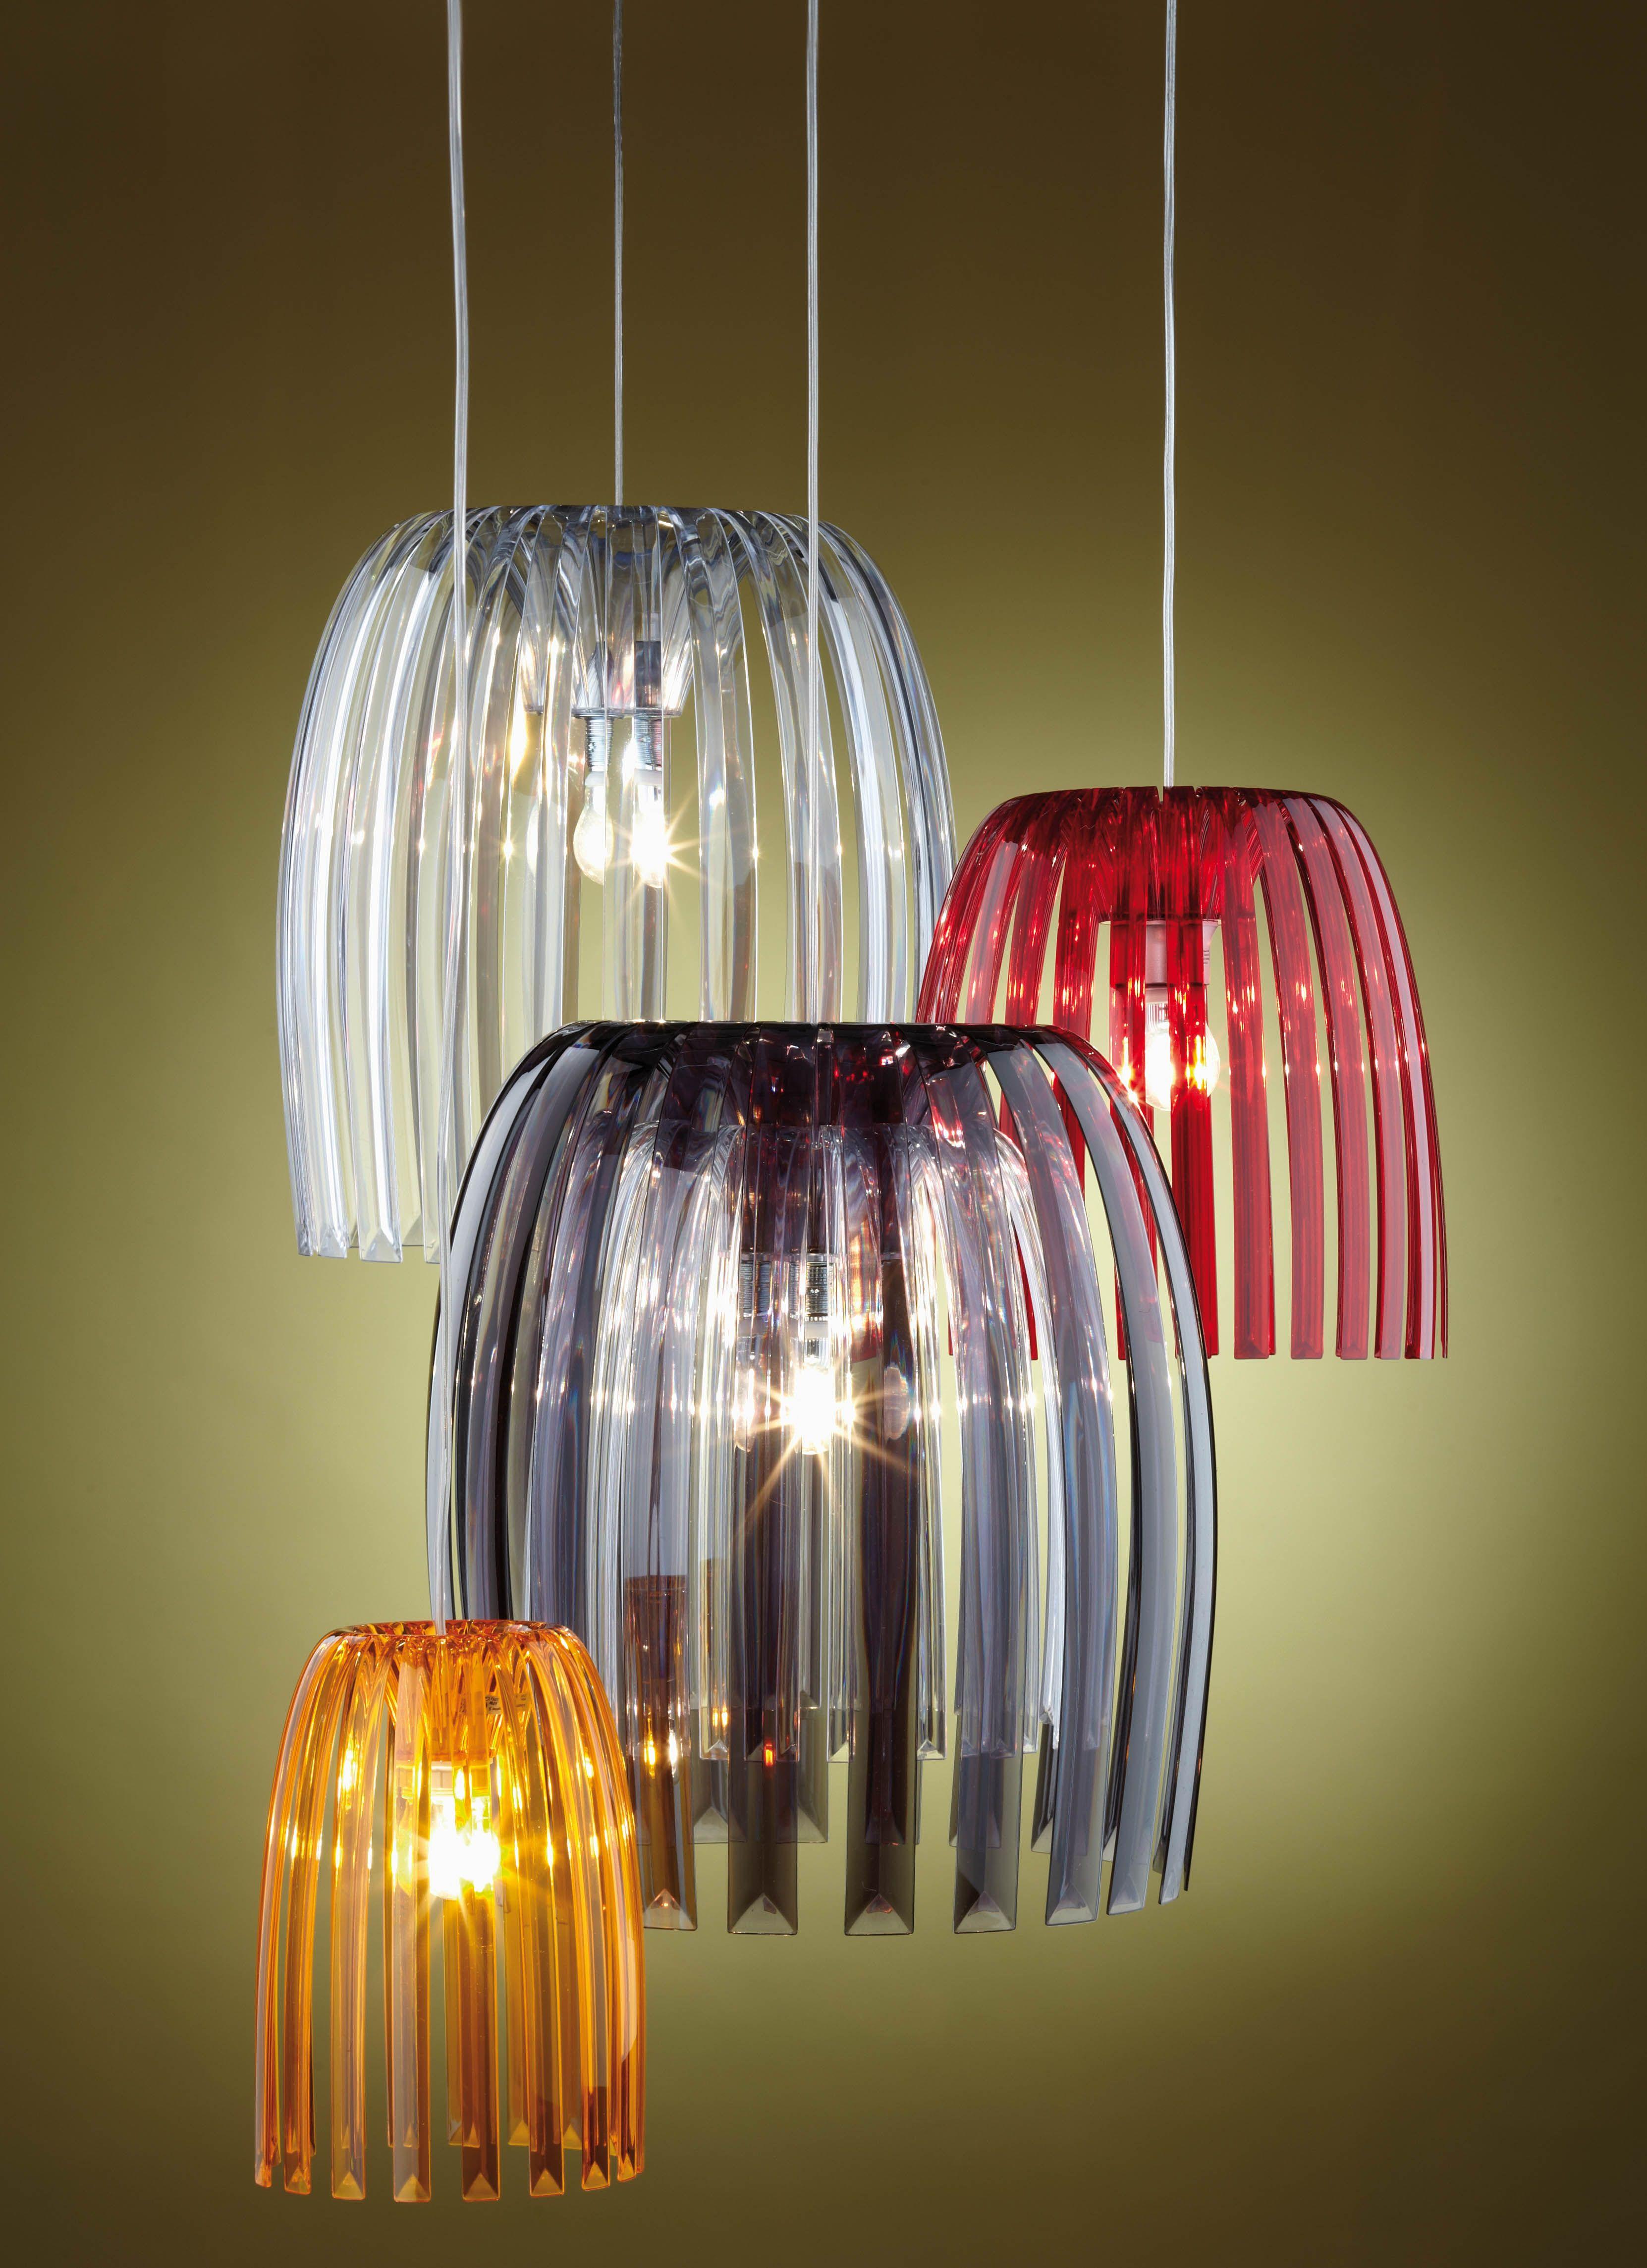 josephine, koziol Now available from IOS Lighting Showroom Northampton #ioslighting